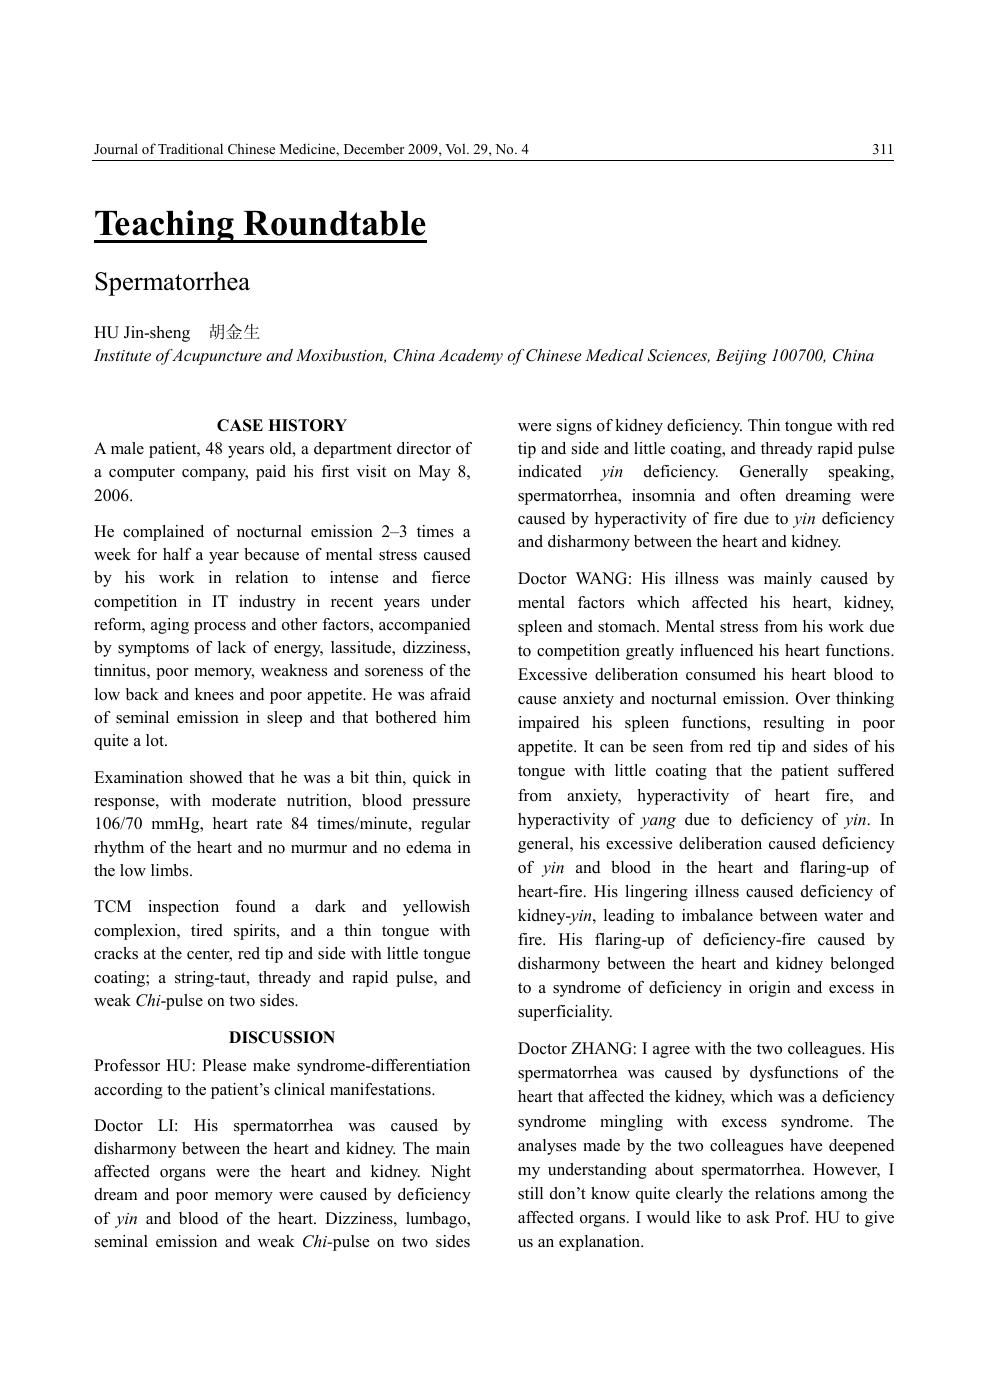 Spermatorrhea – topic of research paper in Basic medicine  Download